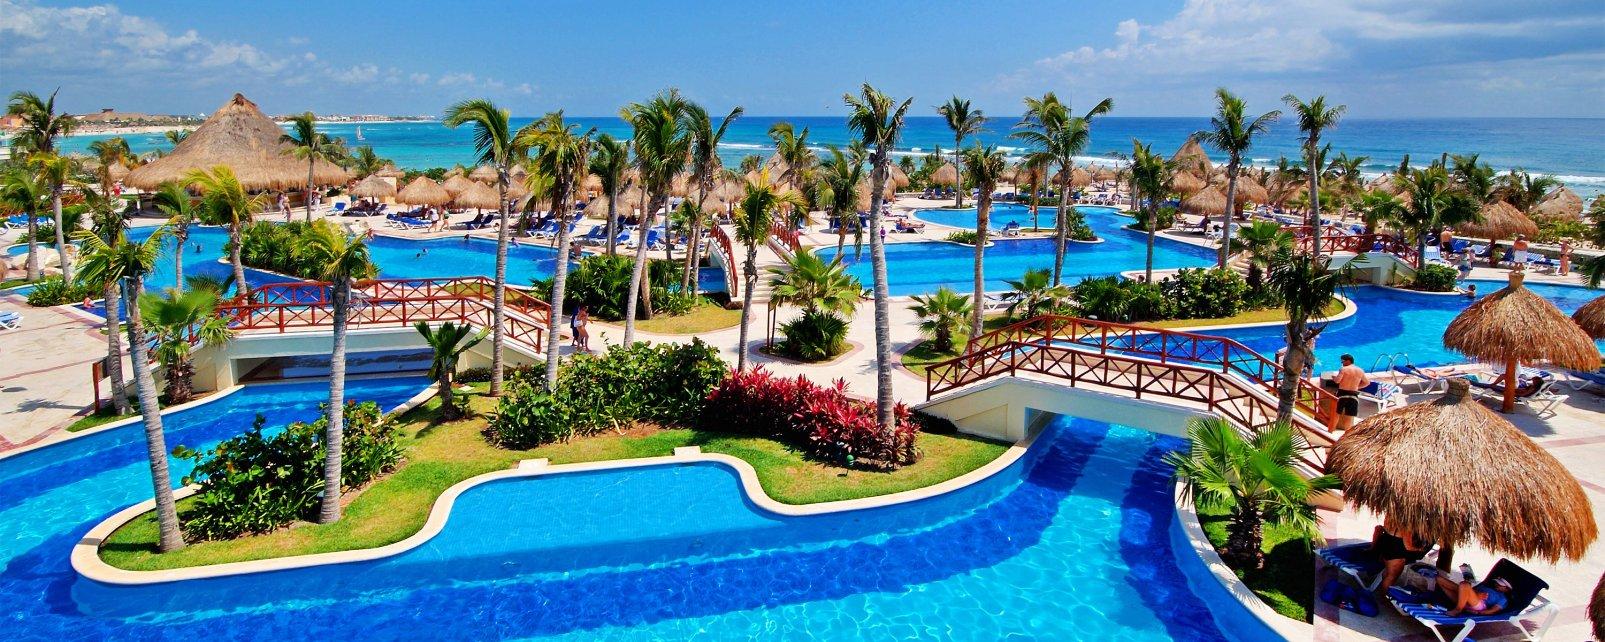 Hotel Grand Bahia Principe Akumal